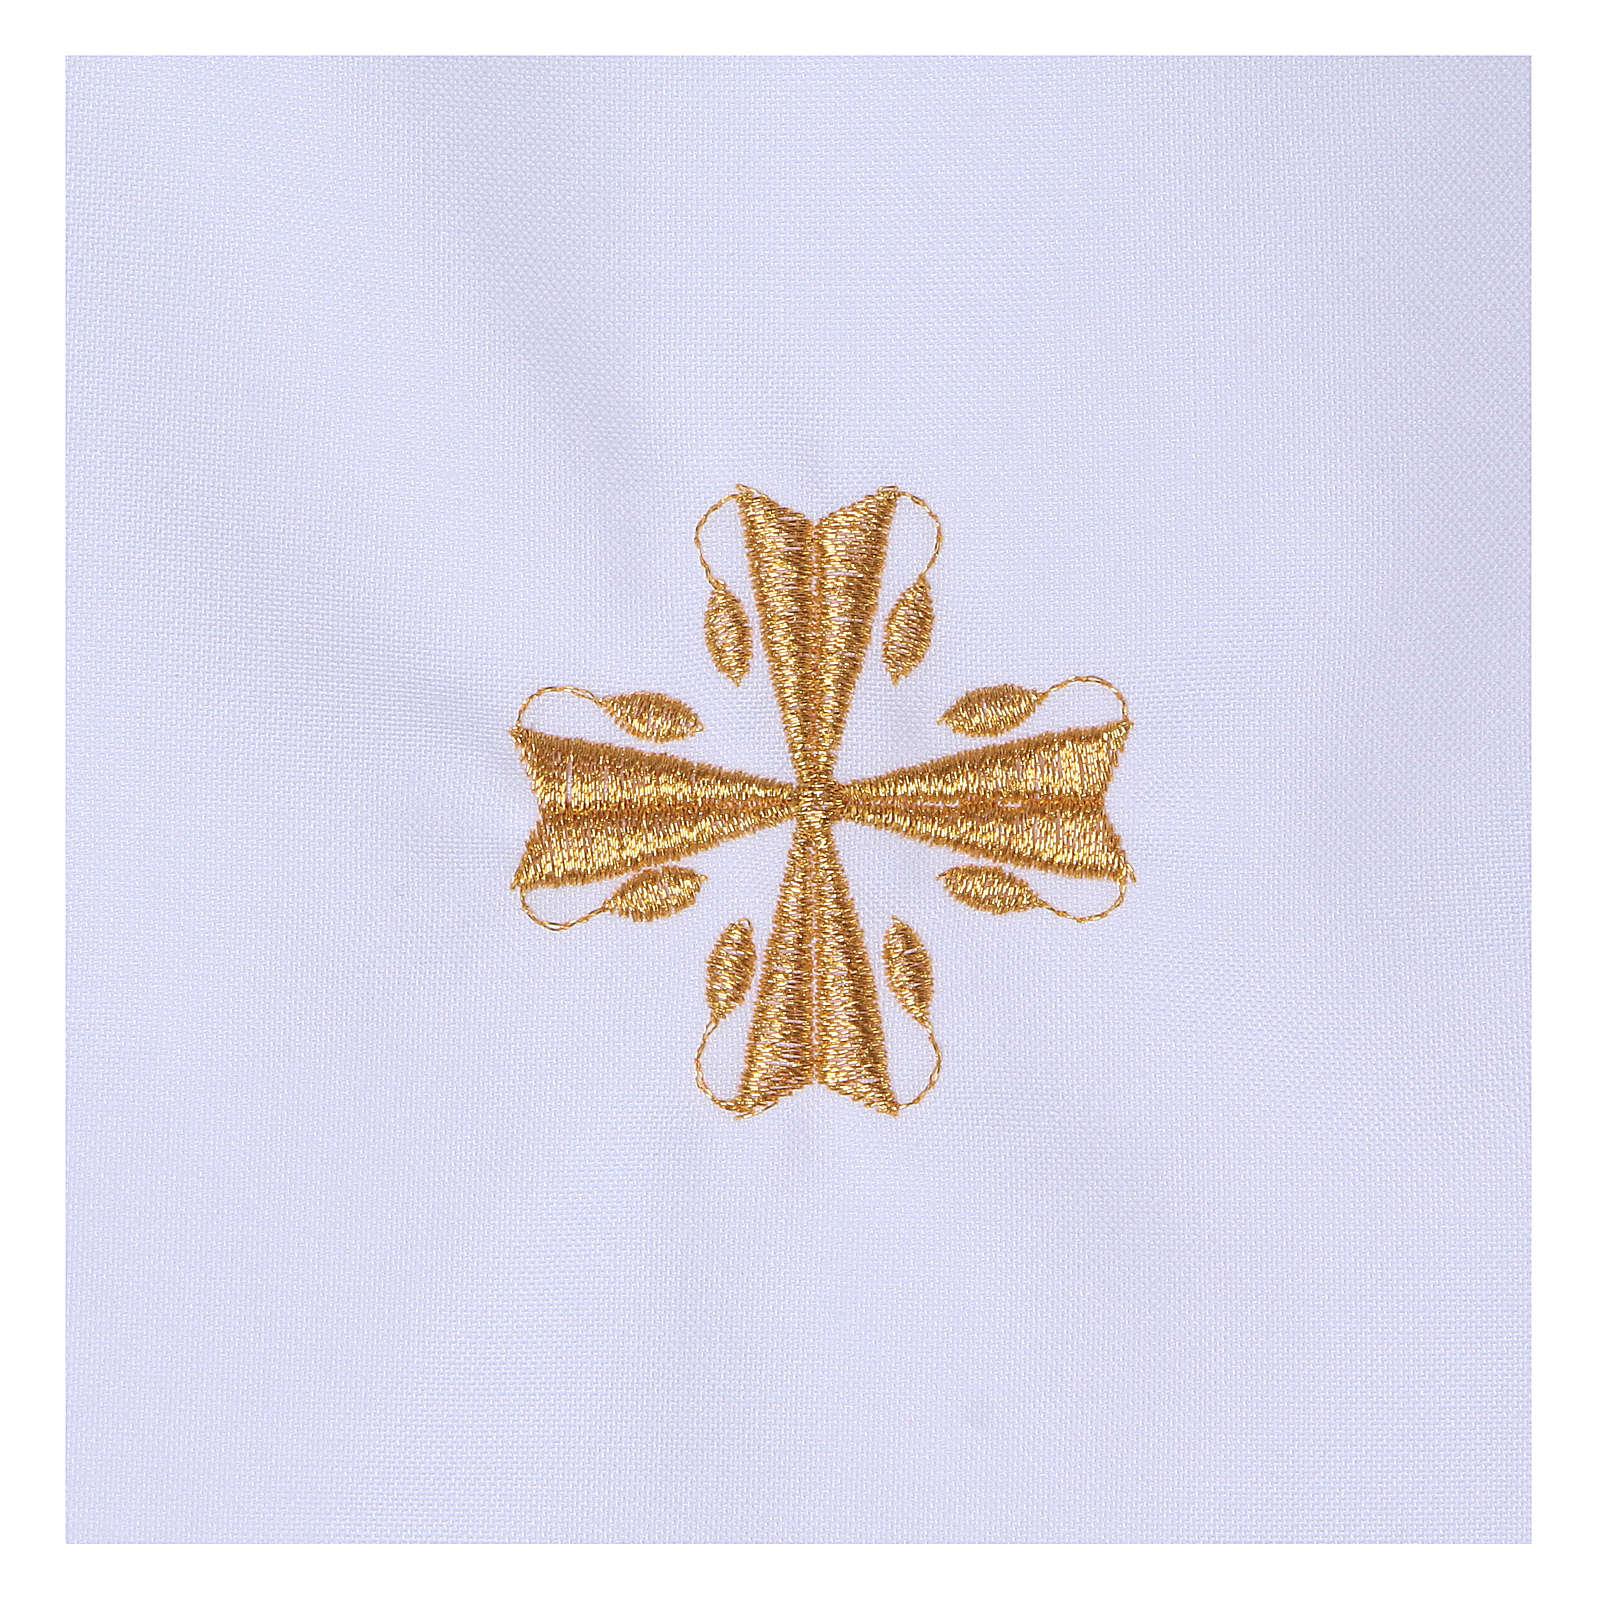 Vestina Battesimo croce 65% poliestere 35% cotone 4